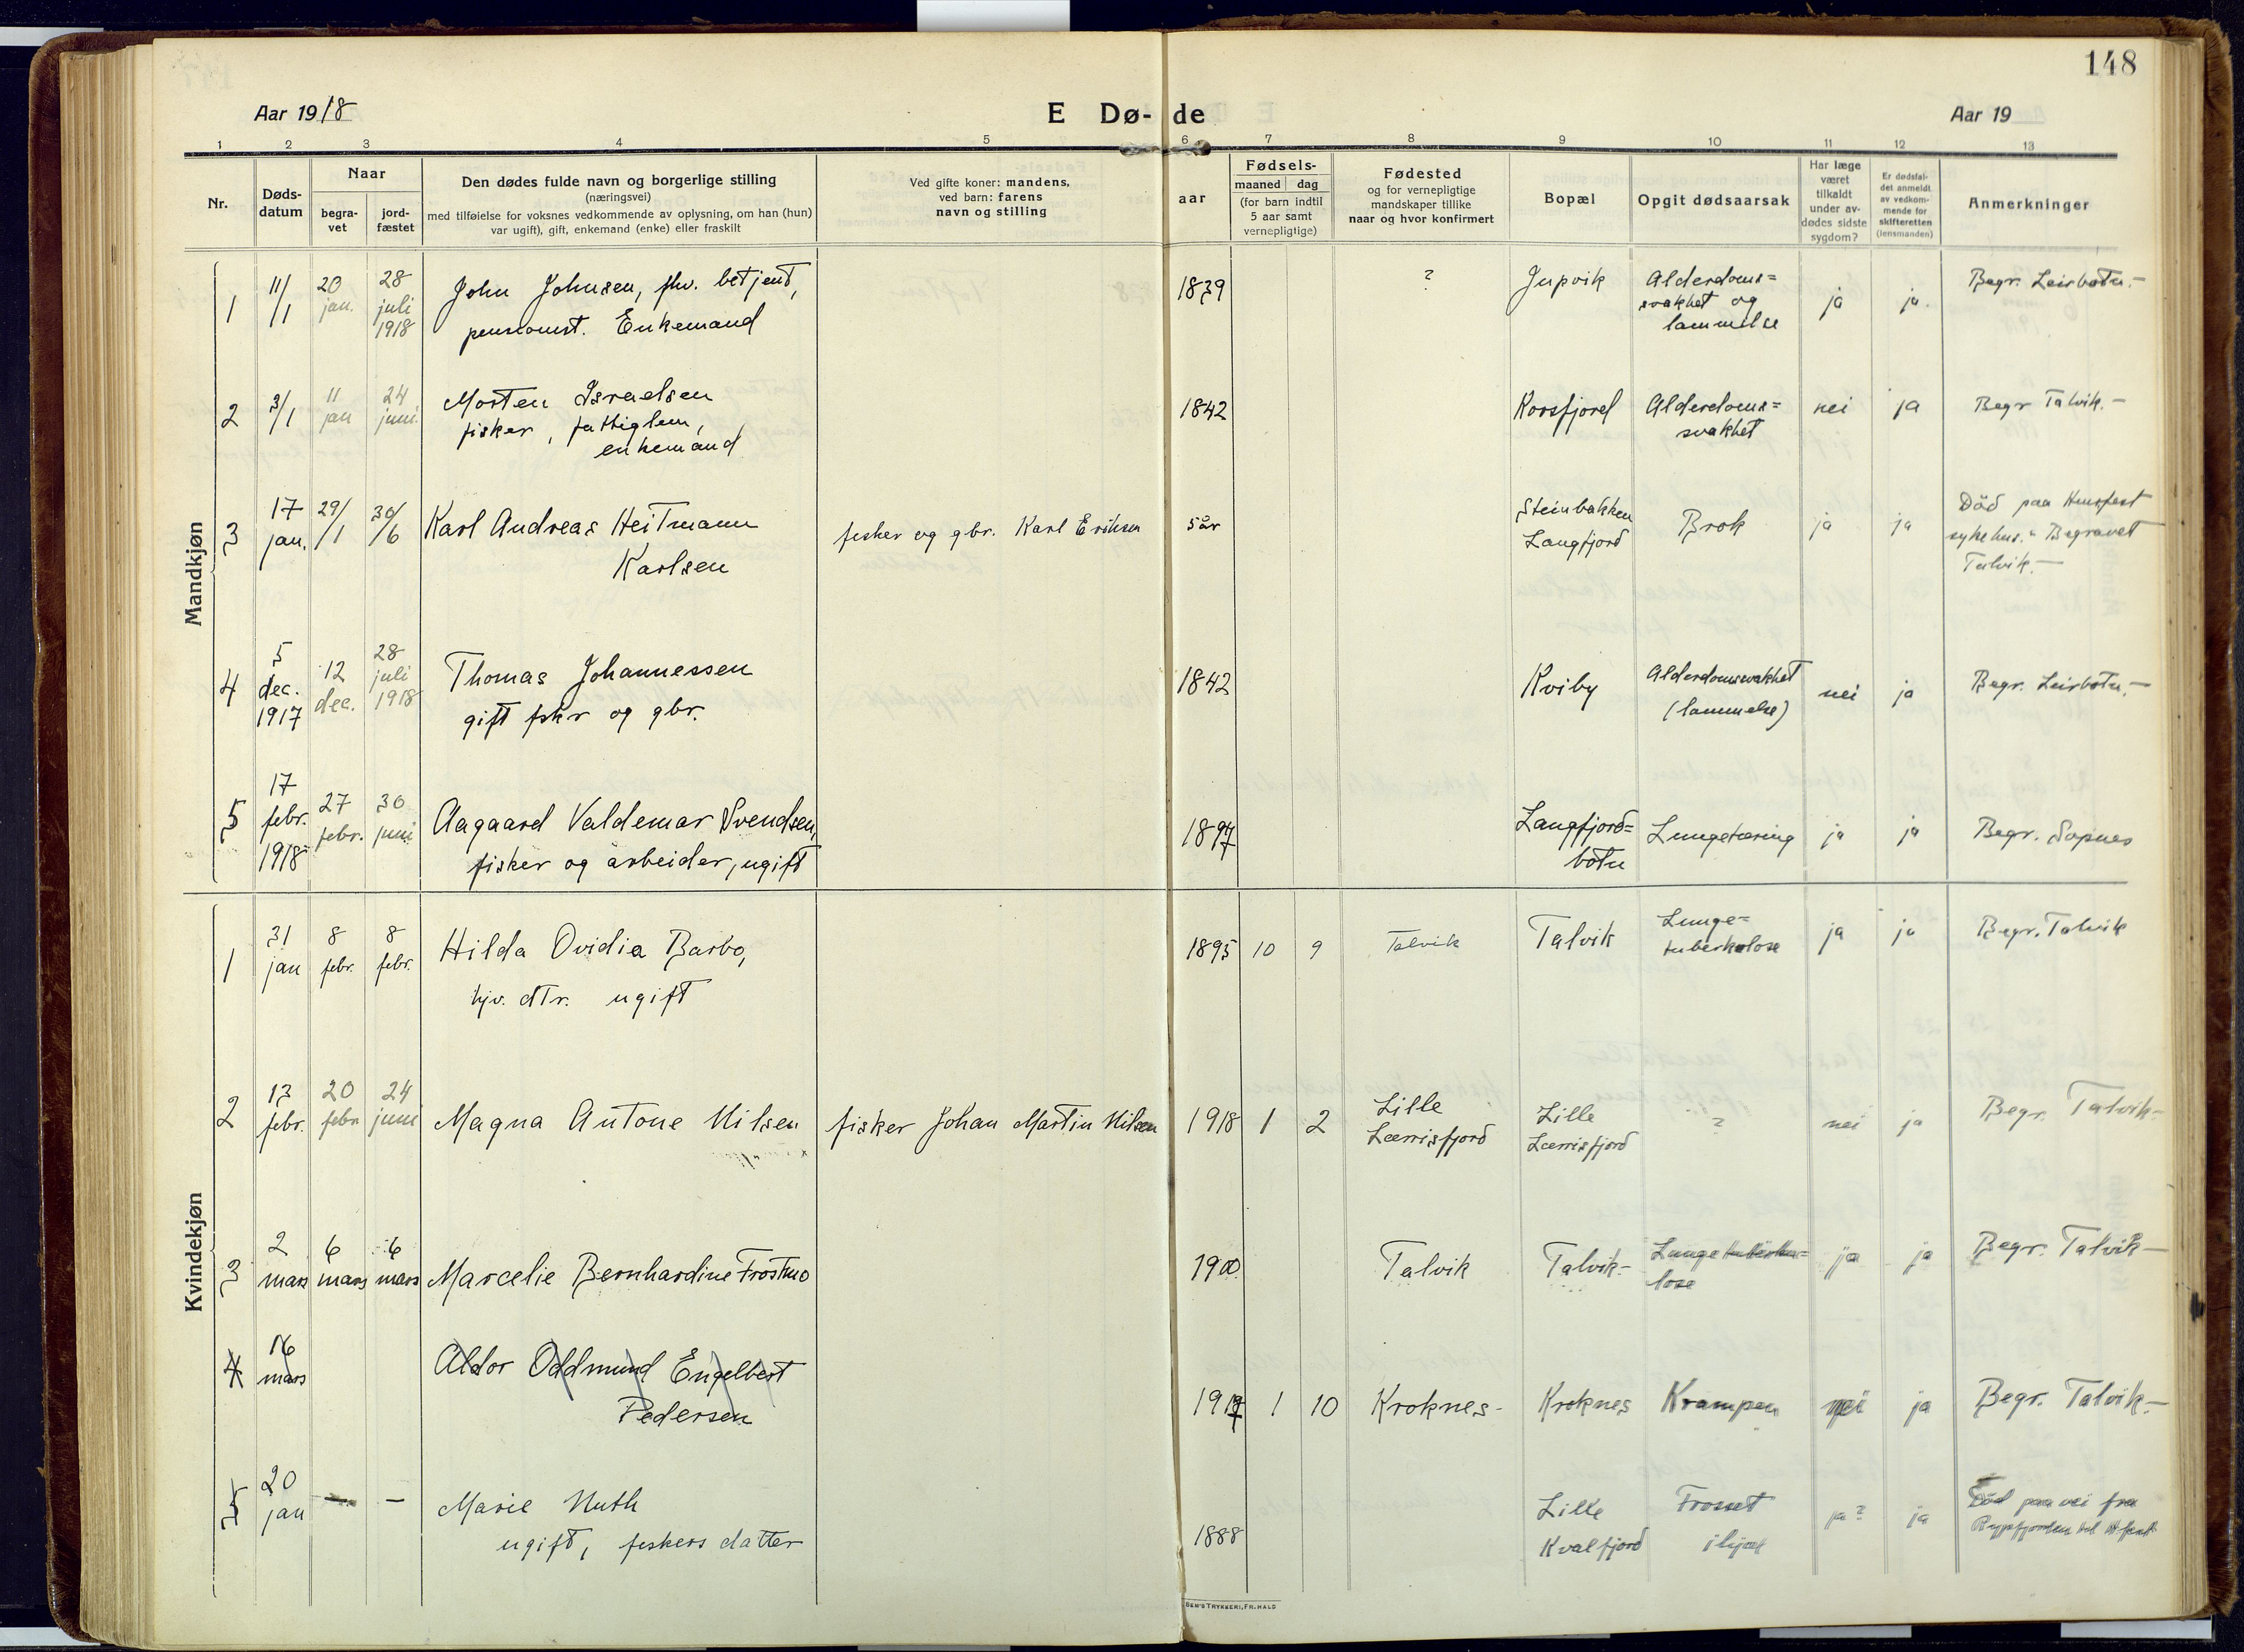 SATØ, Talvik sokneprestkontor, H/Ha/L0018kirke: Ministerialbok nr. 18, 1915-1924, s. 148